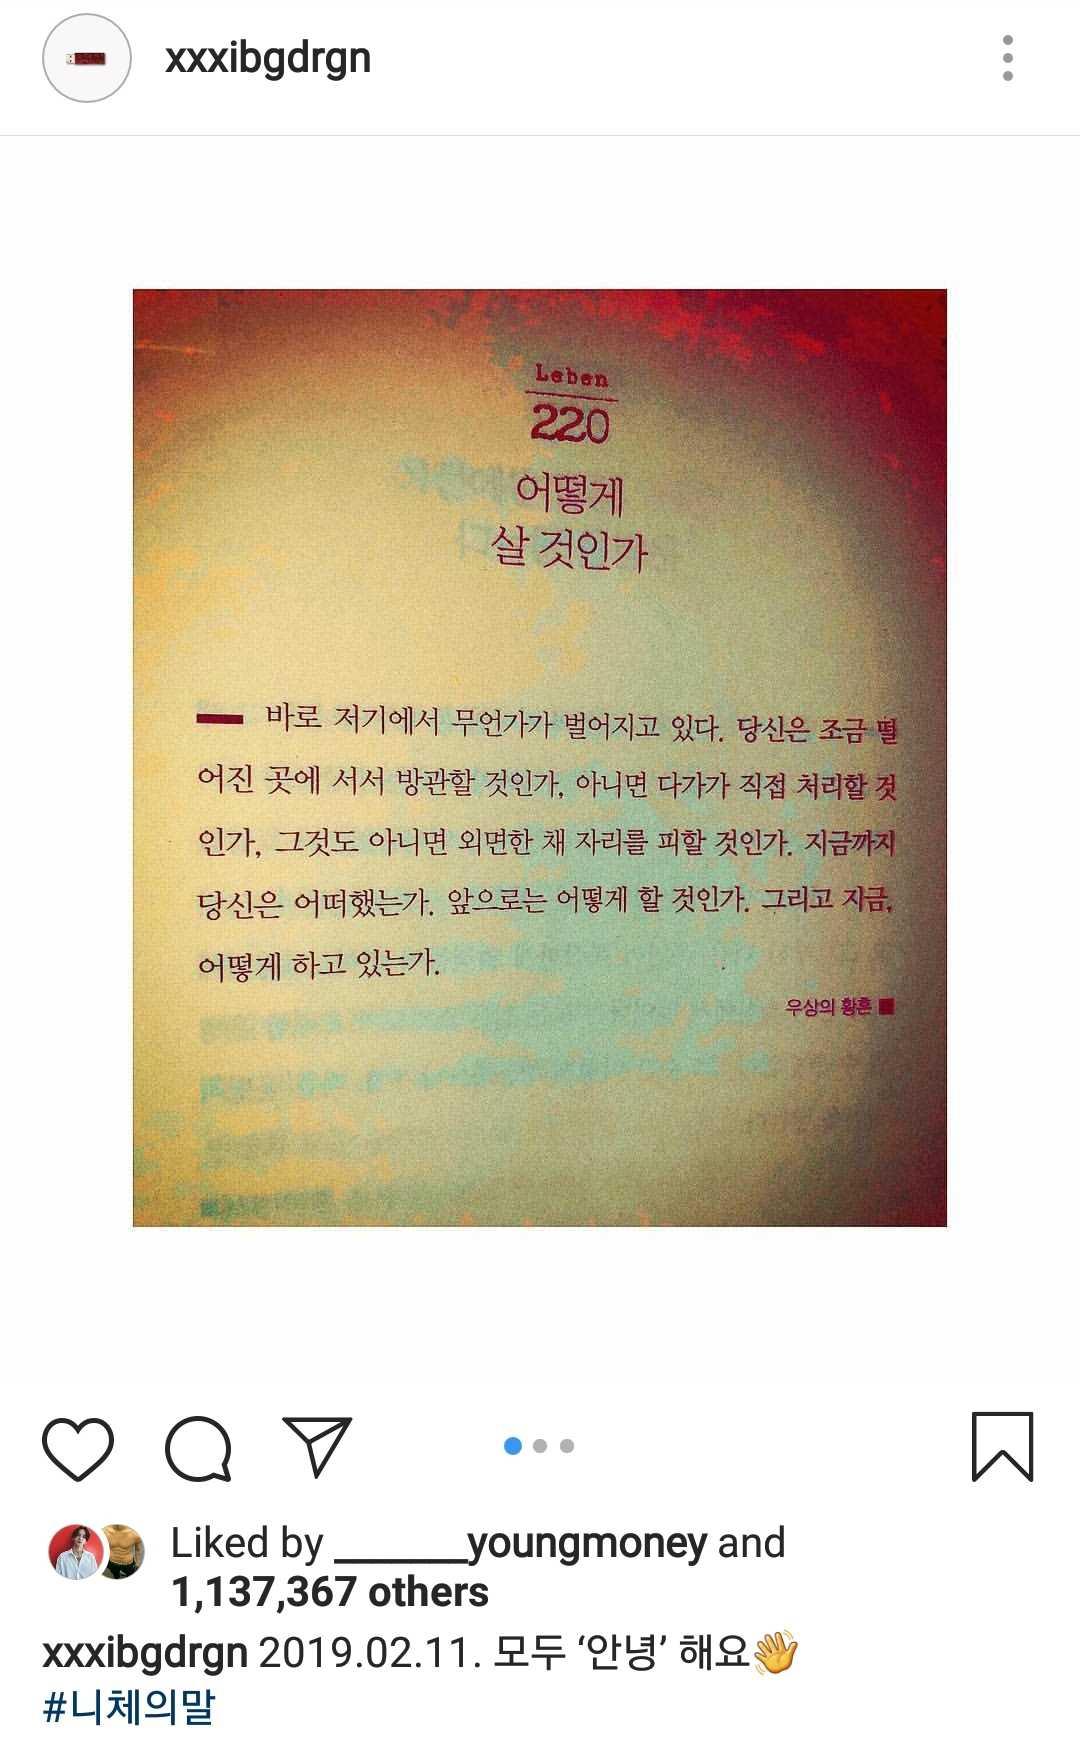 g-dragon 2019 instagram 1